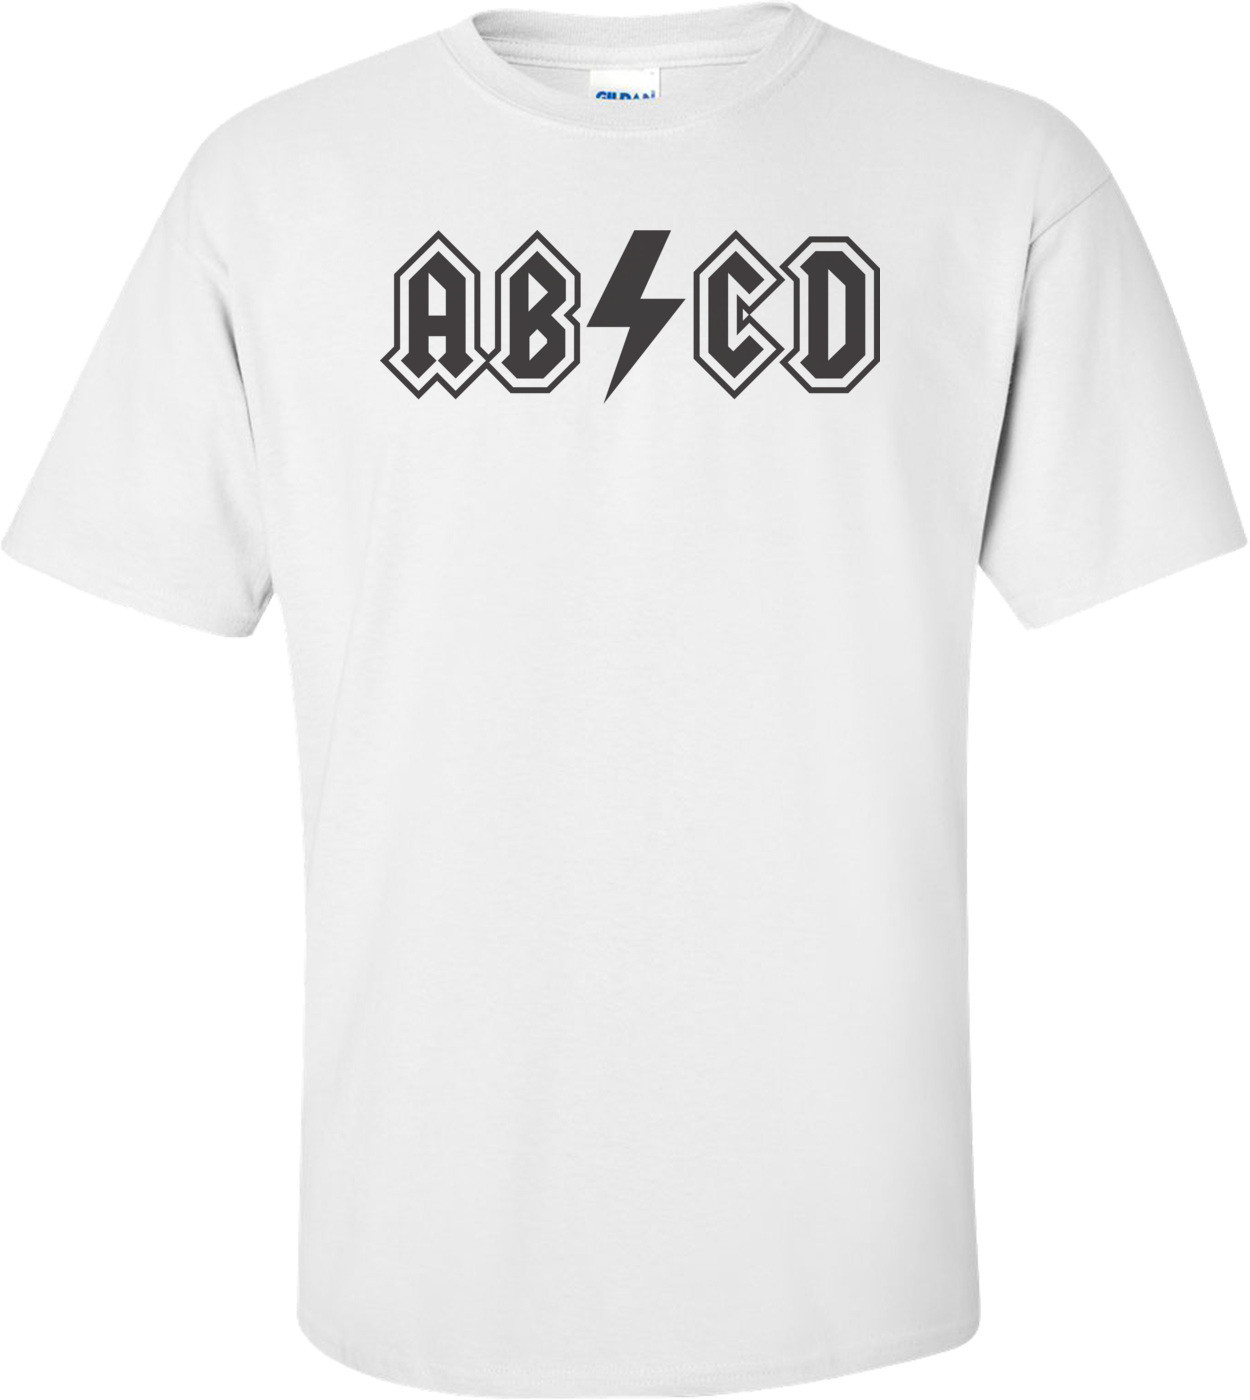 Abcd - Baby Shirt